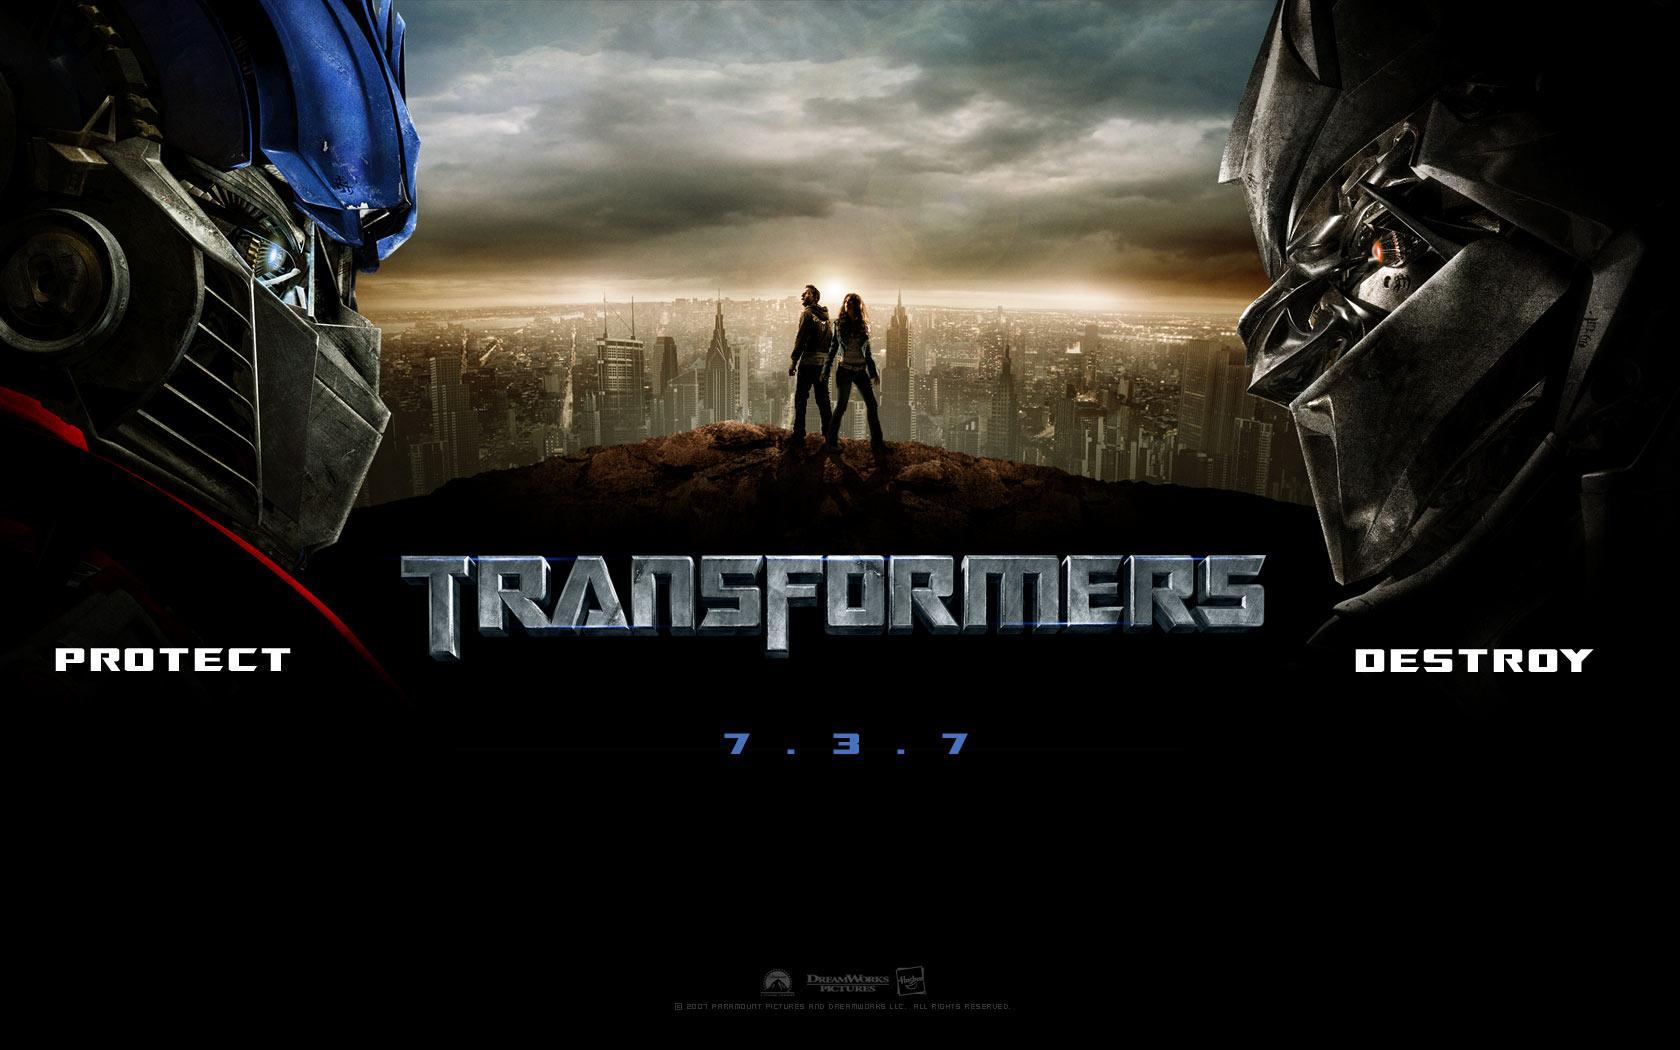 Transformers4_1680x1050